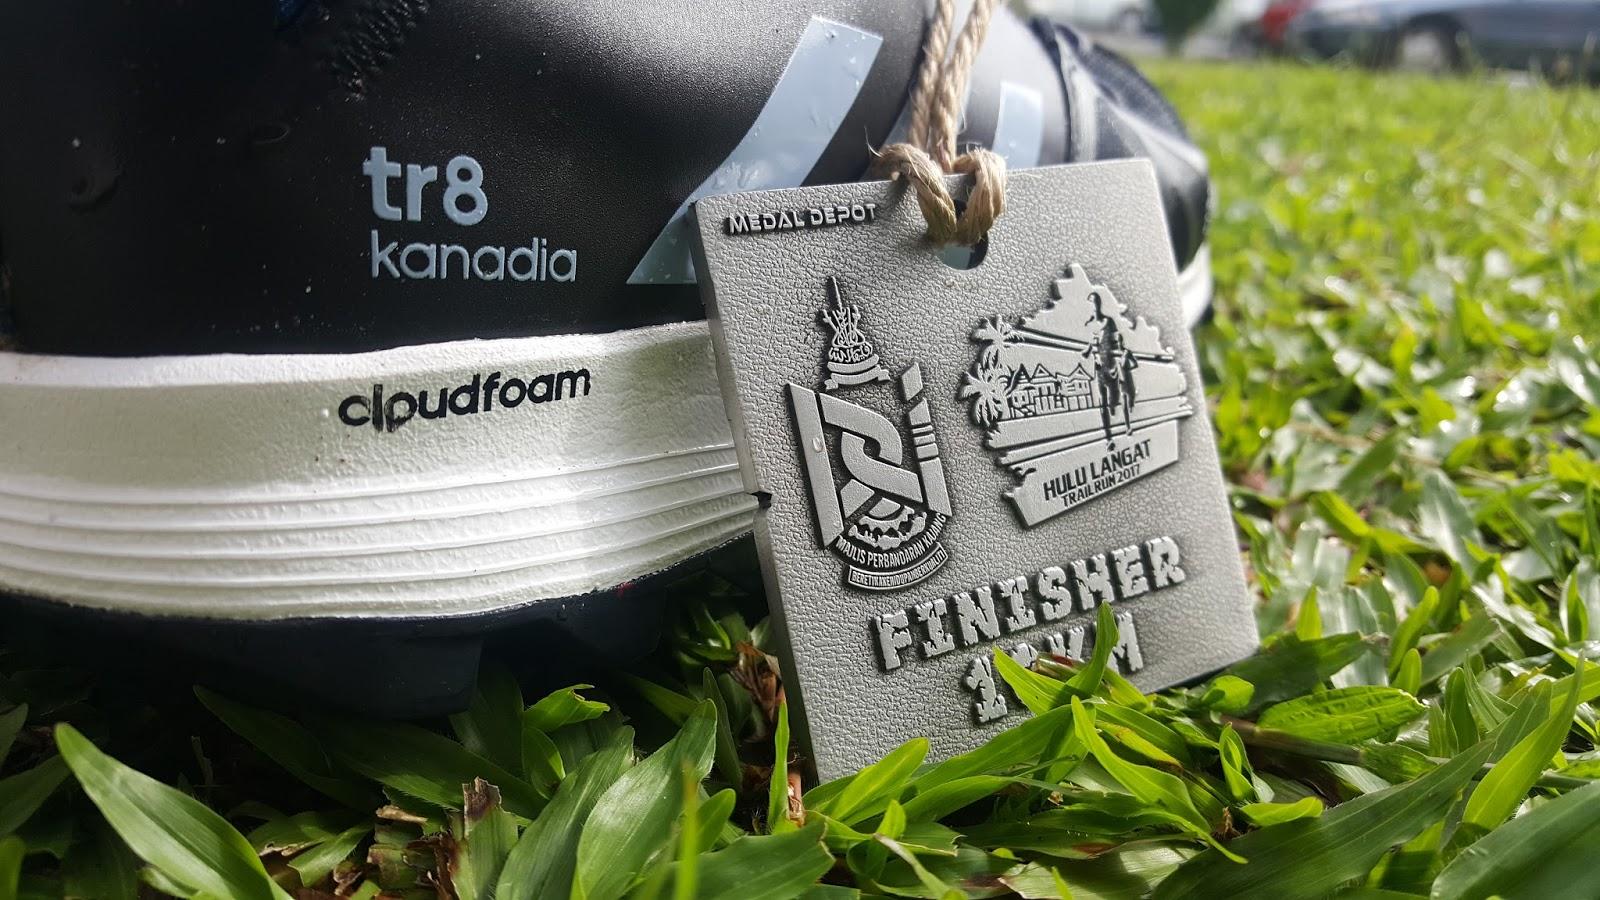 Finisher 10 KM